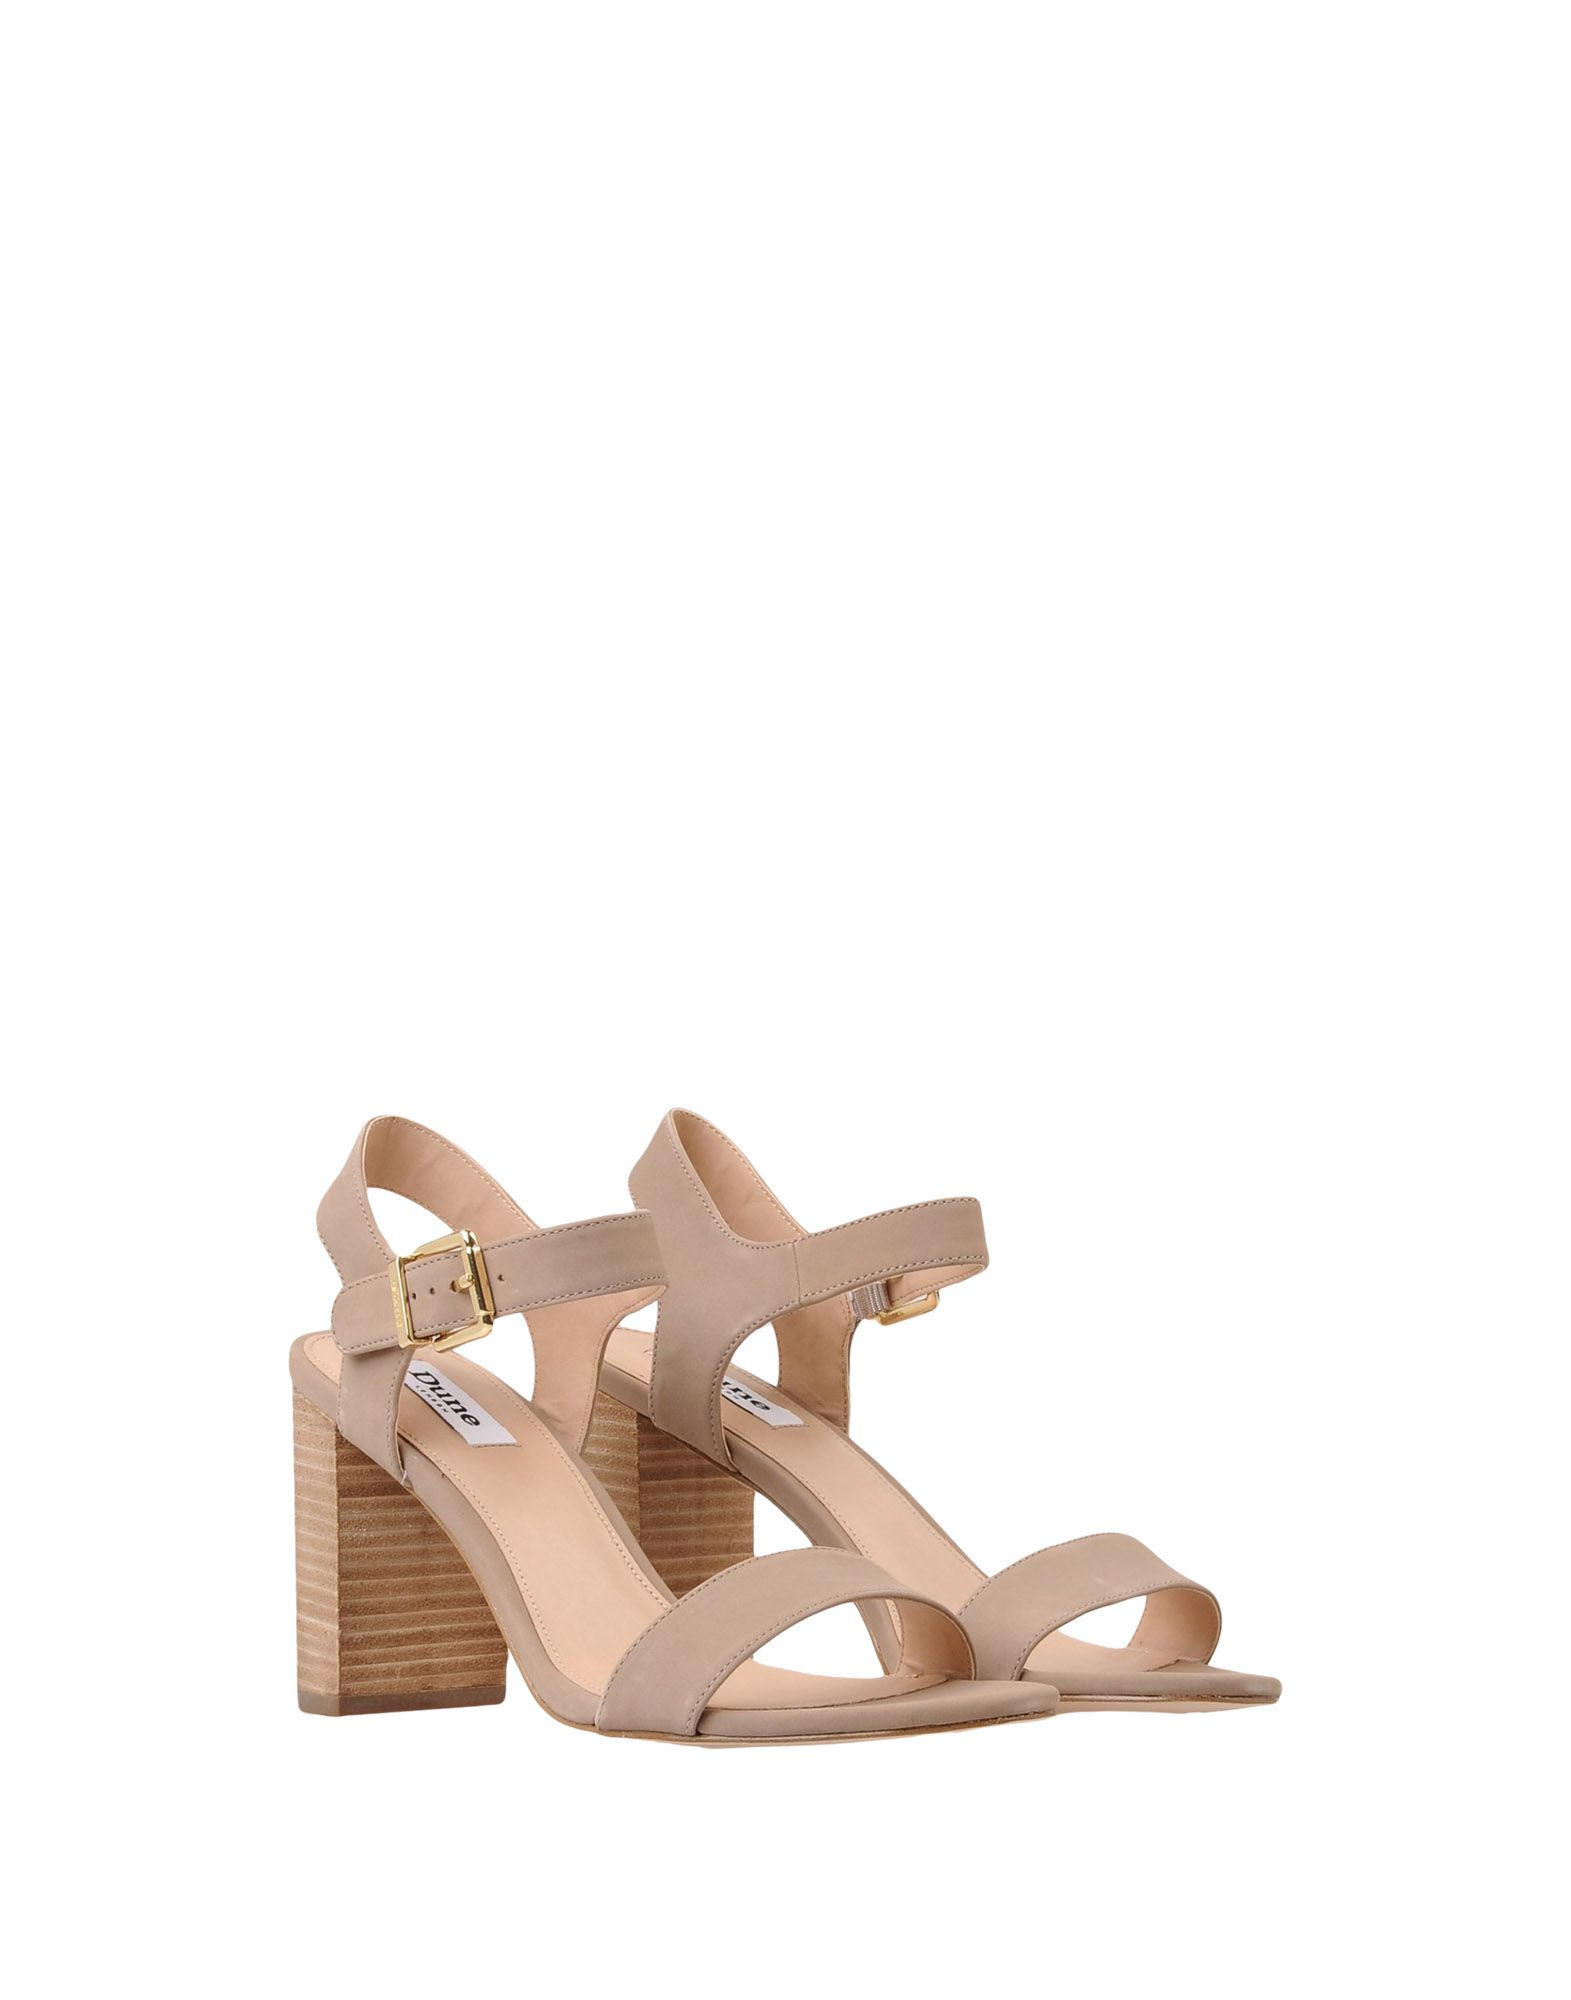 Dune  London Isobel  Dune 11451416UU Gute Qualität beliebte Schuhe 2f242b